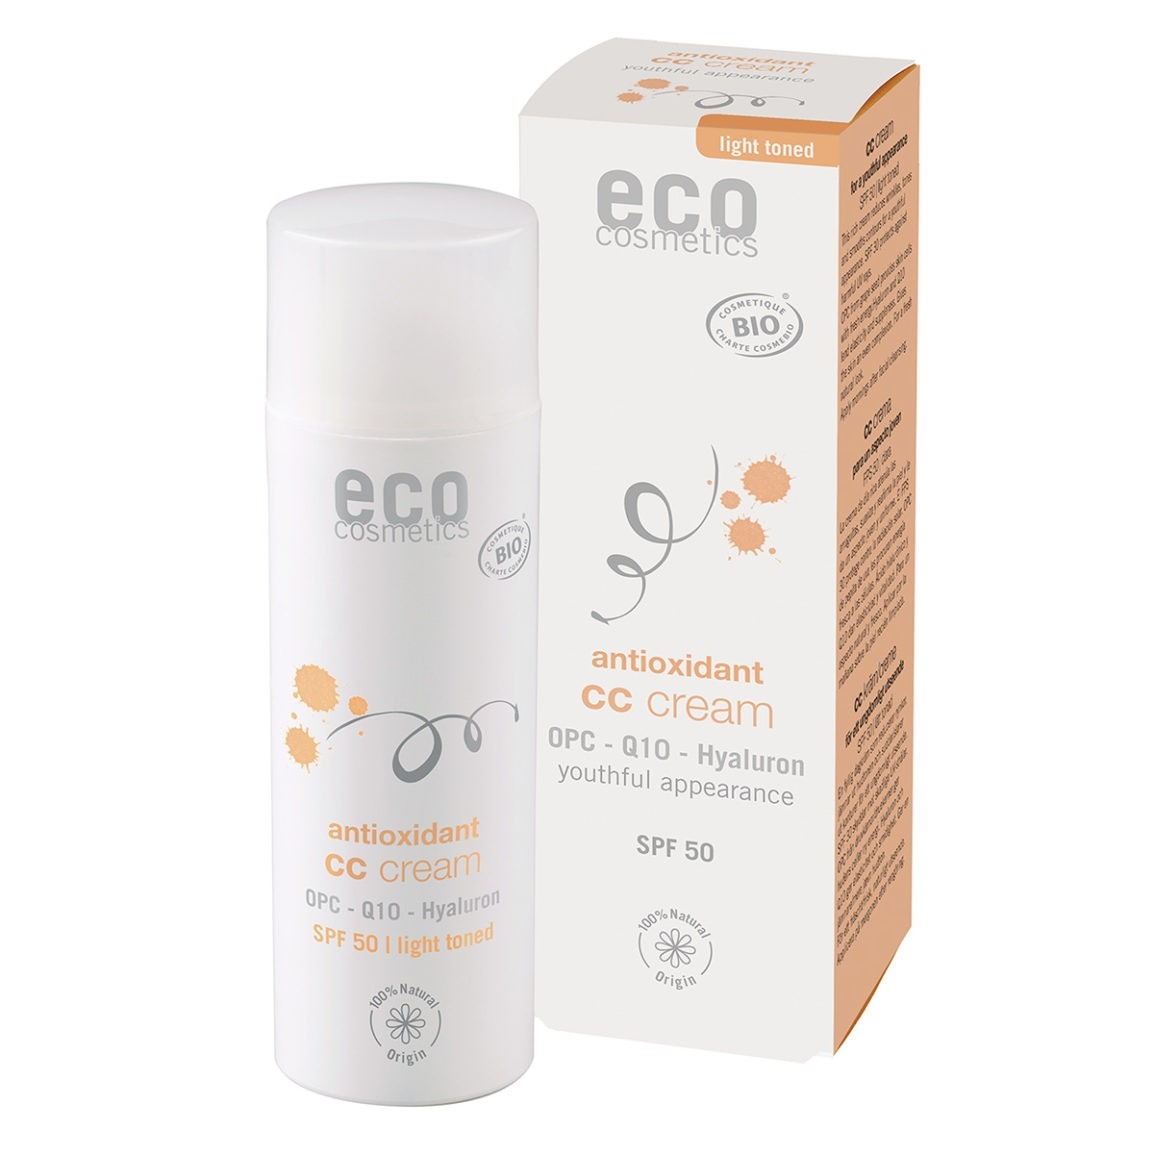 Eco Cosmetics Tinted CC Cream Antioxidant SPF 50